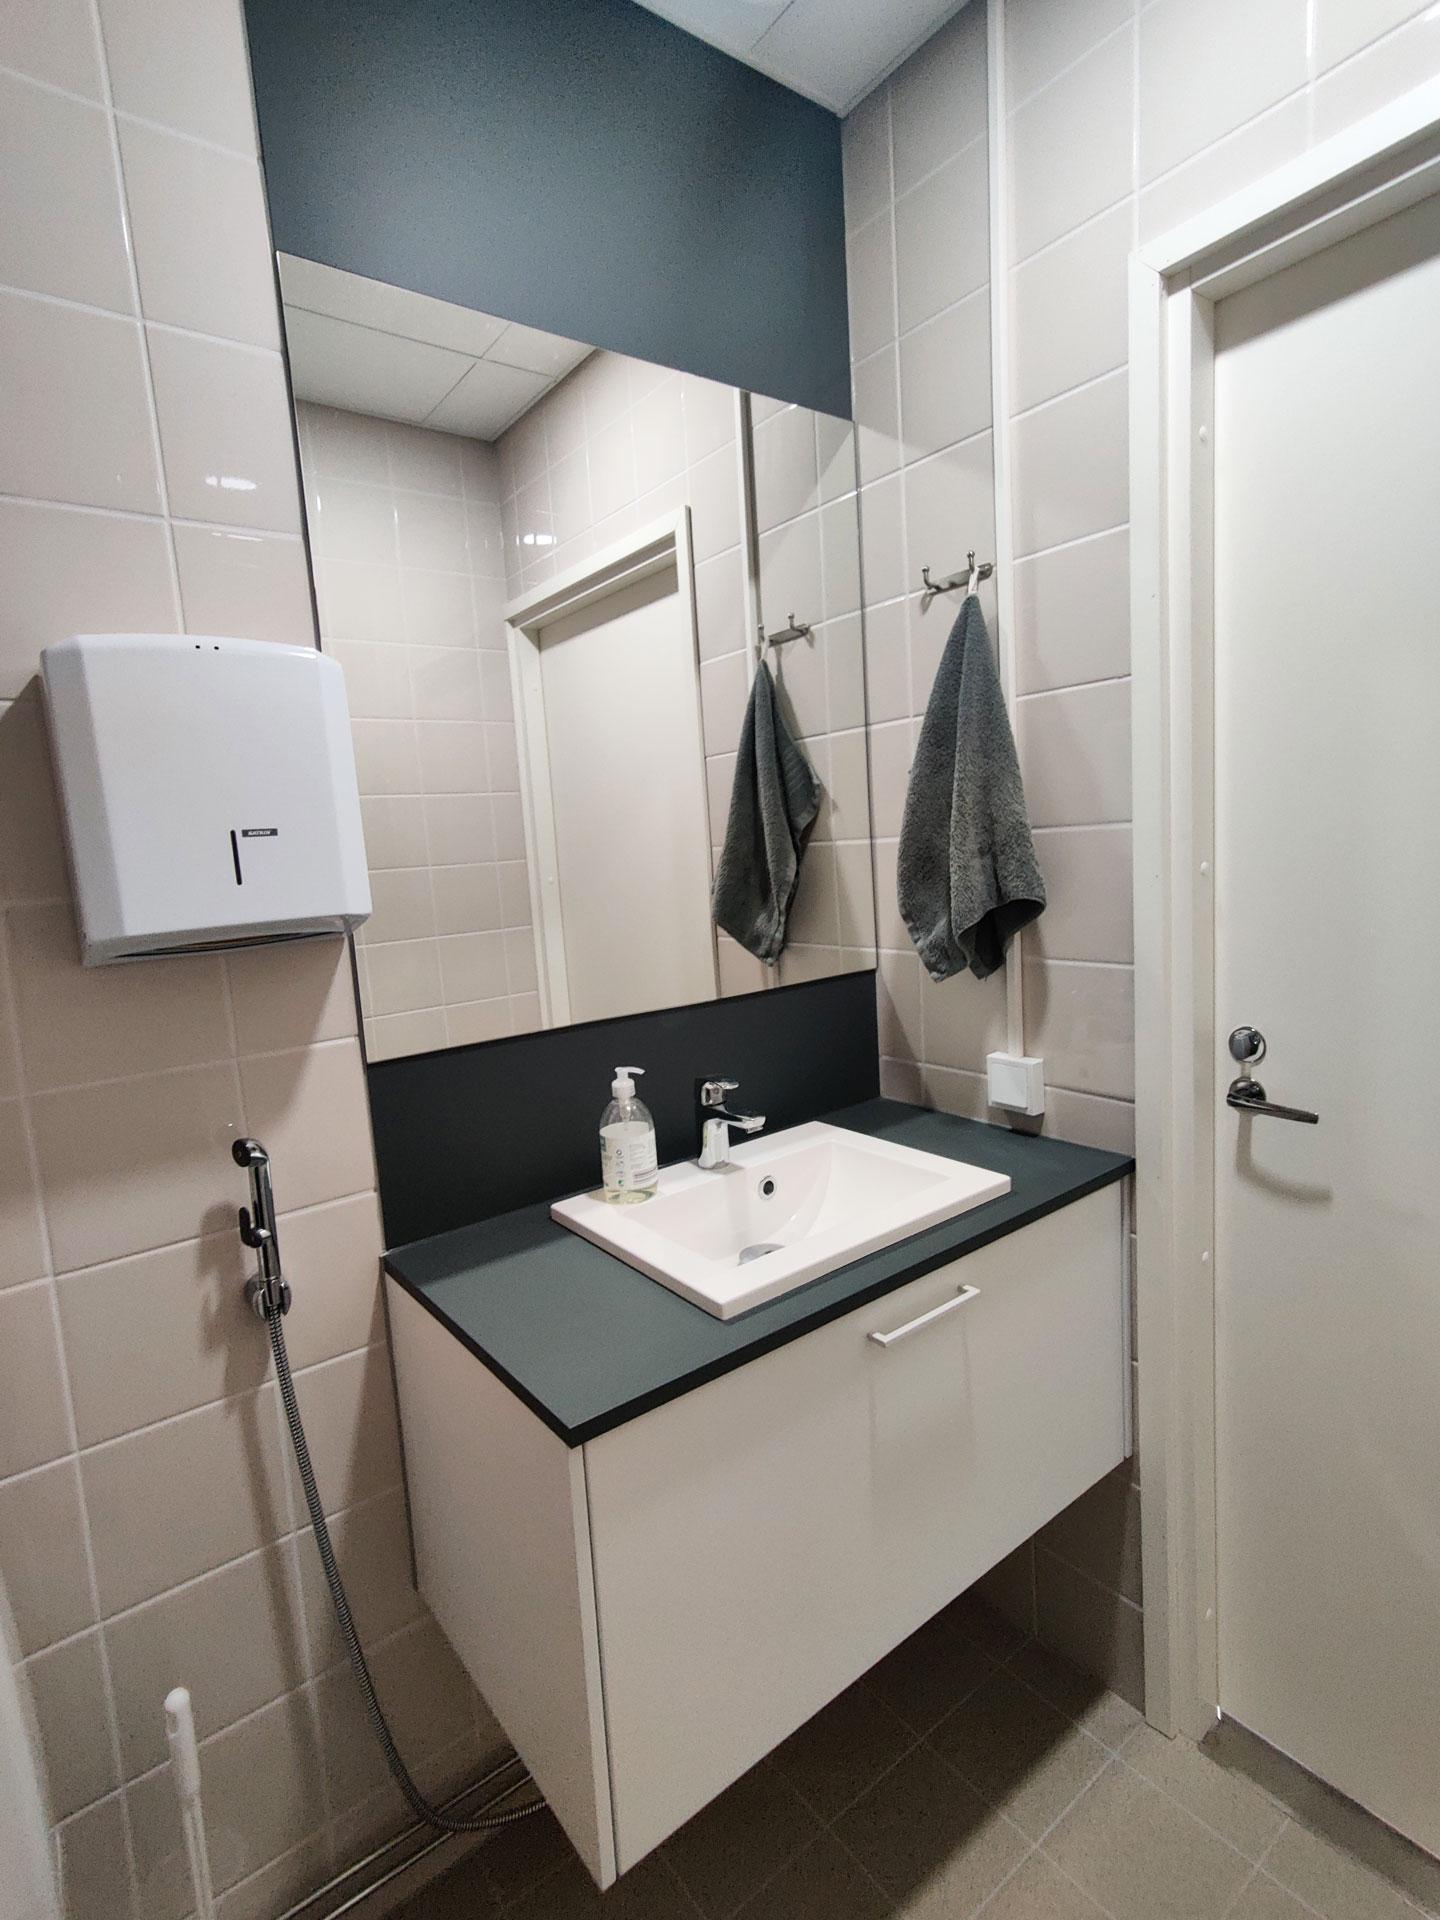 Yleinen wc-tila